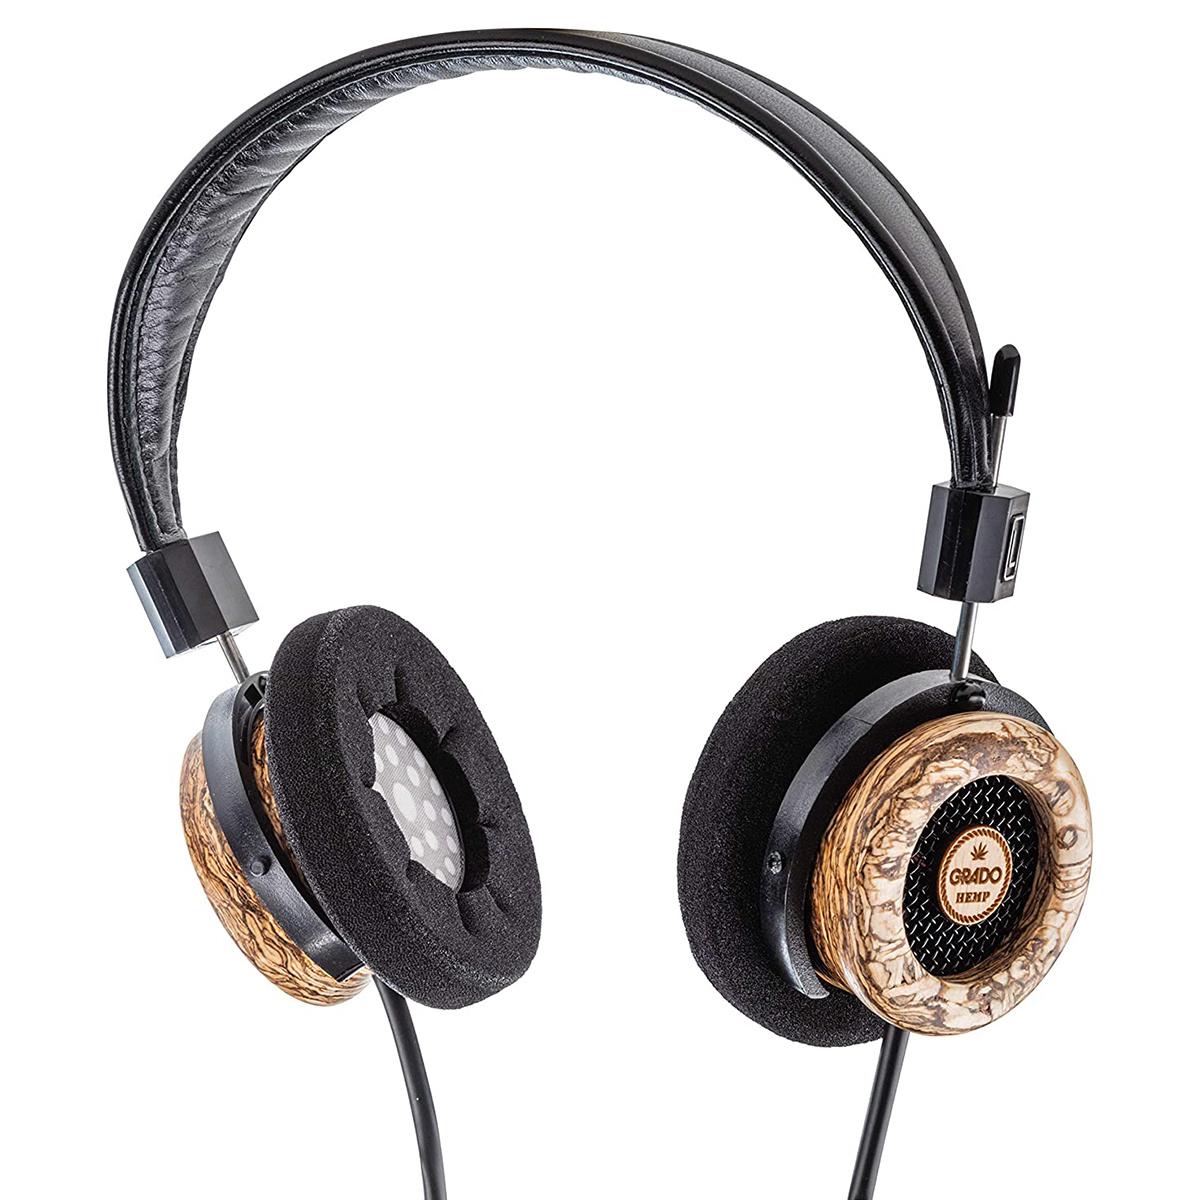 Grado Labs The Hemp Headphone | Limited Edition